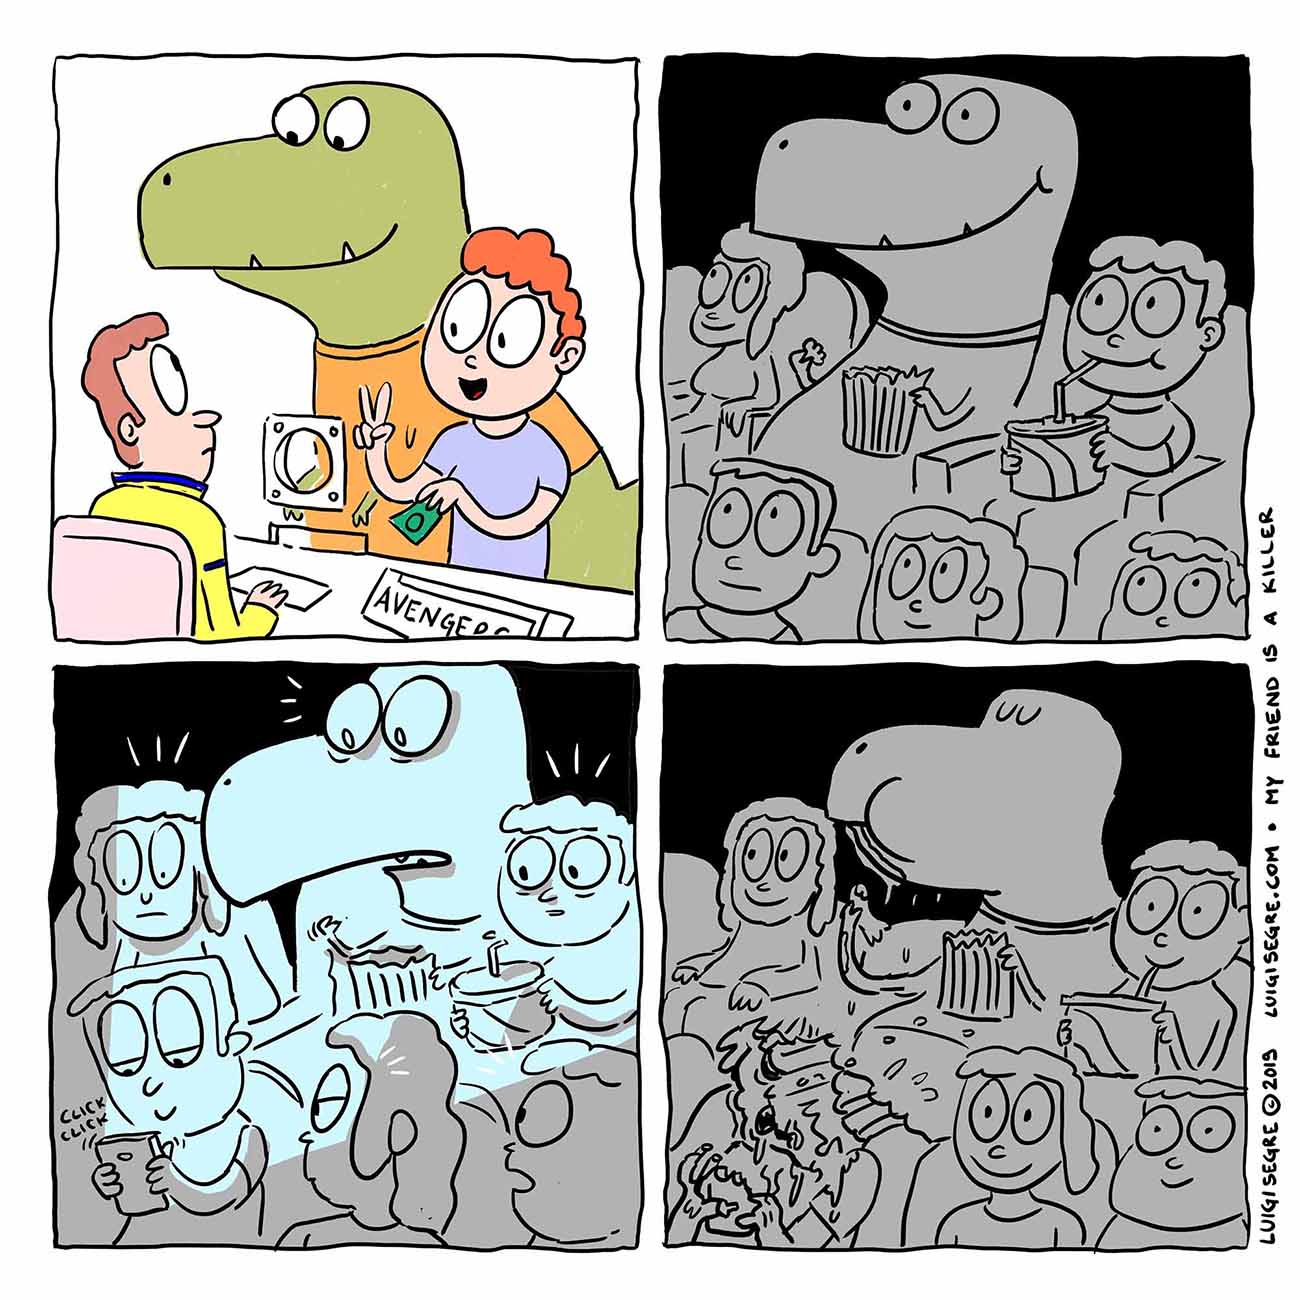 Contenuti_Low_Res_Luigi_Segre_Cartoons_2019_my_friend_is_a_killer_01.jpg